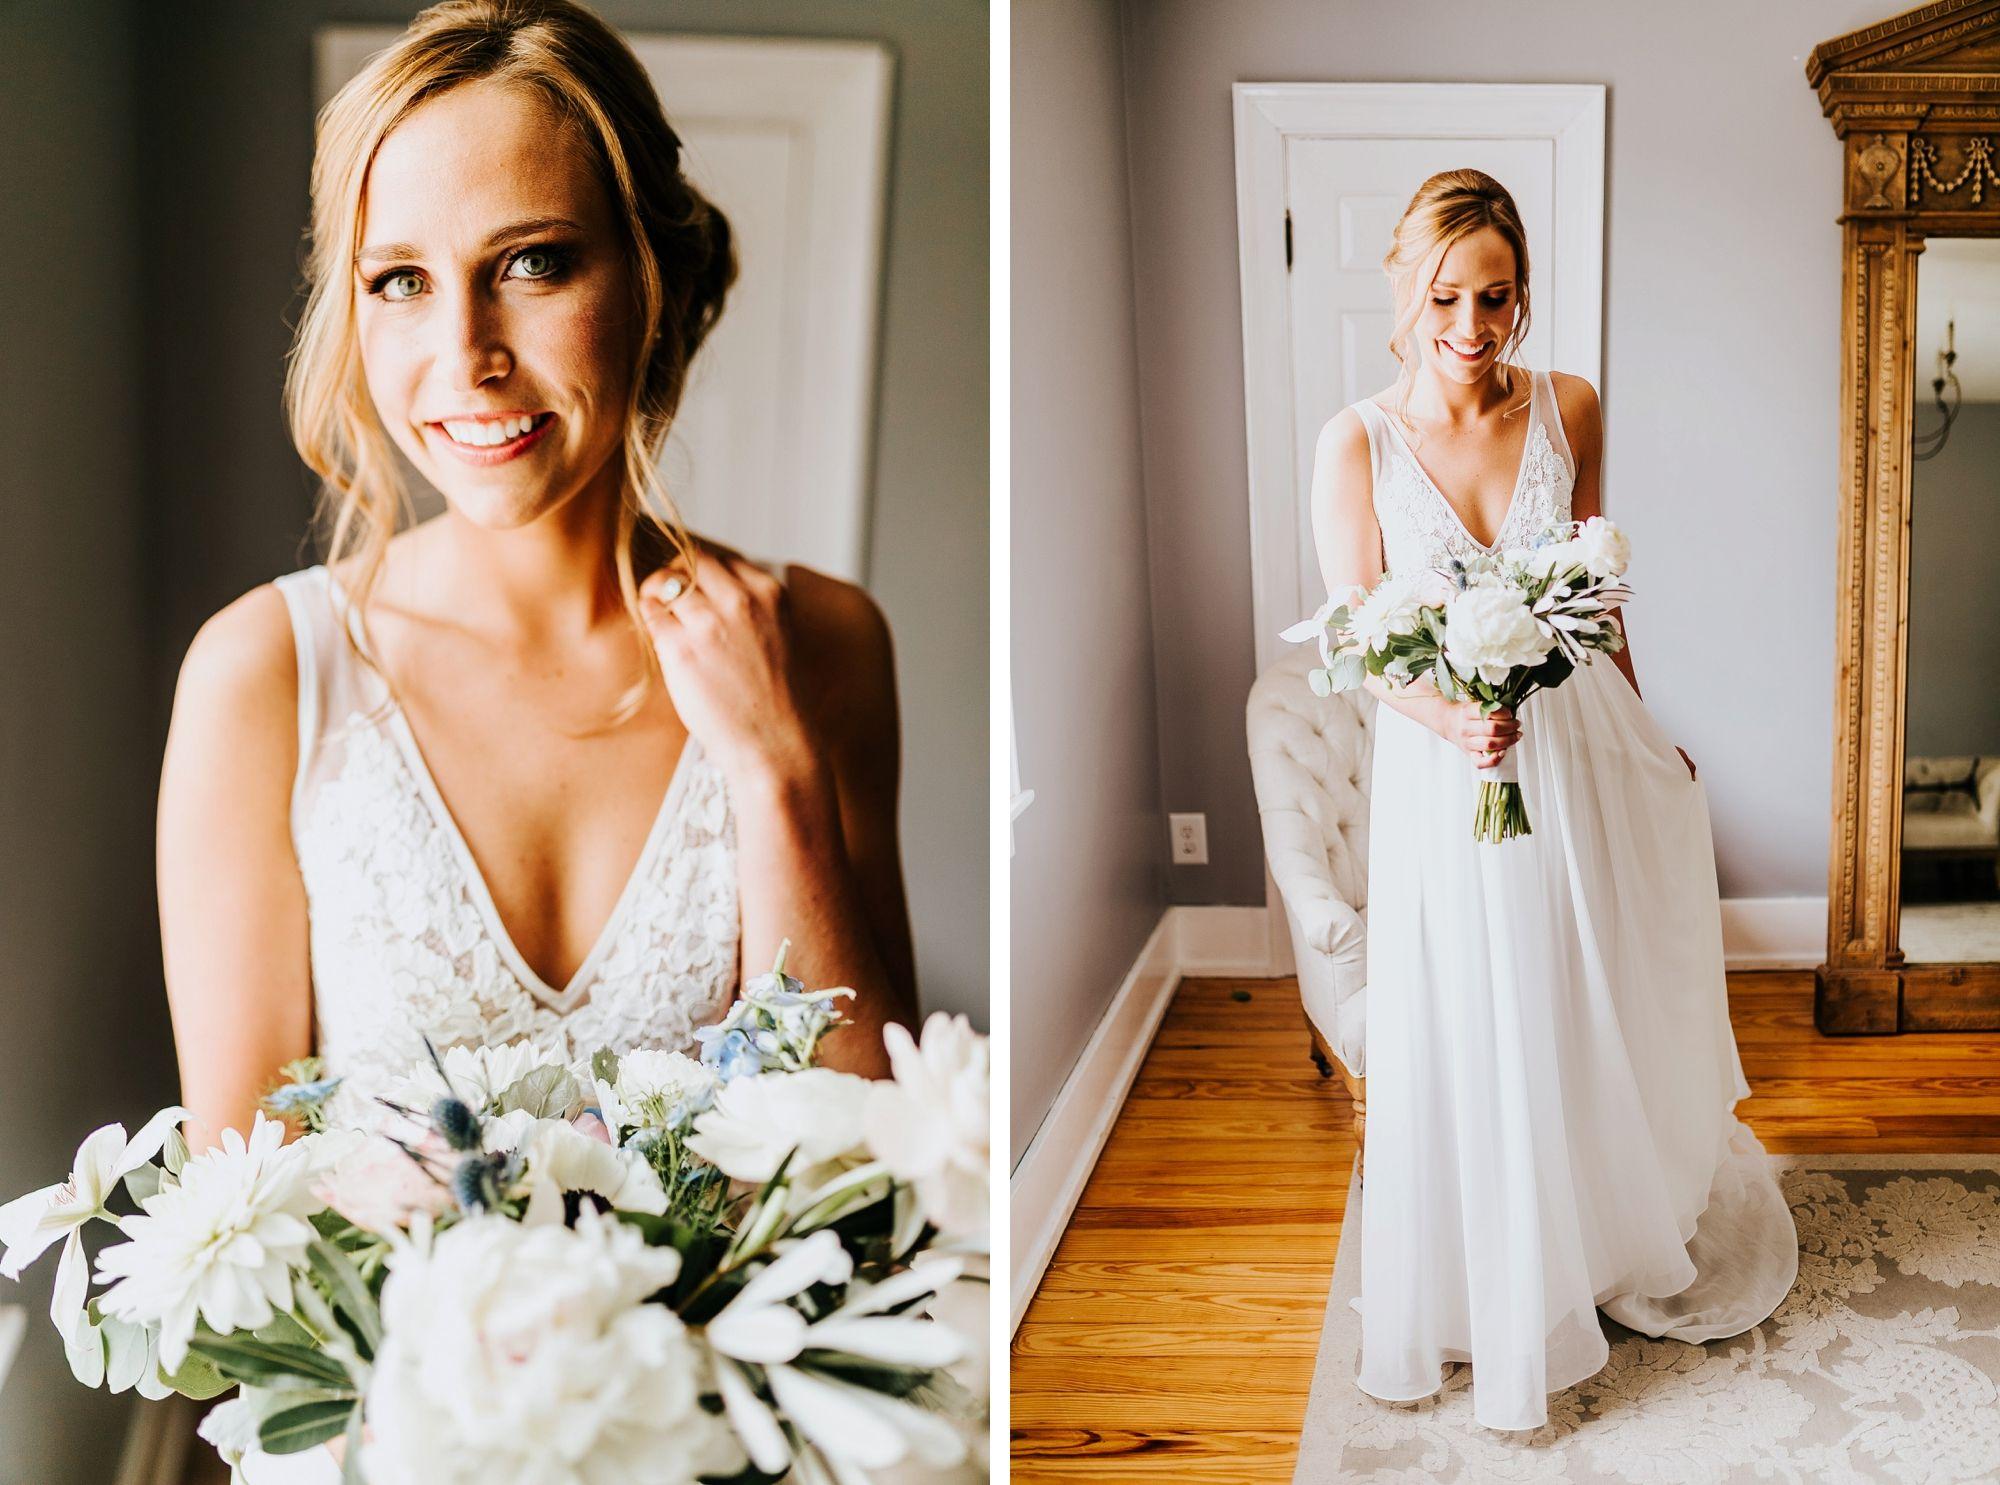 St Louis Wedding Photographer Stone House St Charles Missouri Wedding Photographer Couples Sess Wedding Dresses Lace St Louis Wedding Wedding Dresses